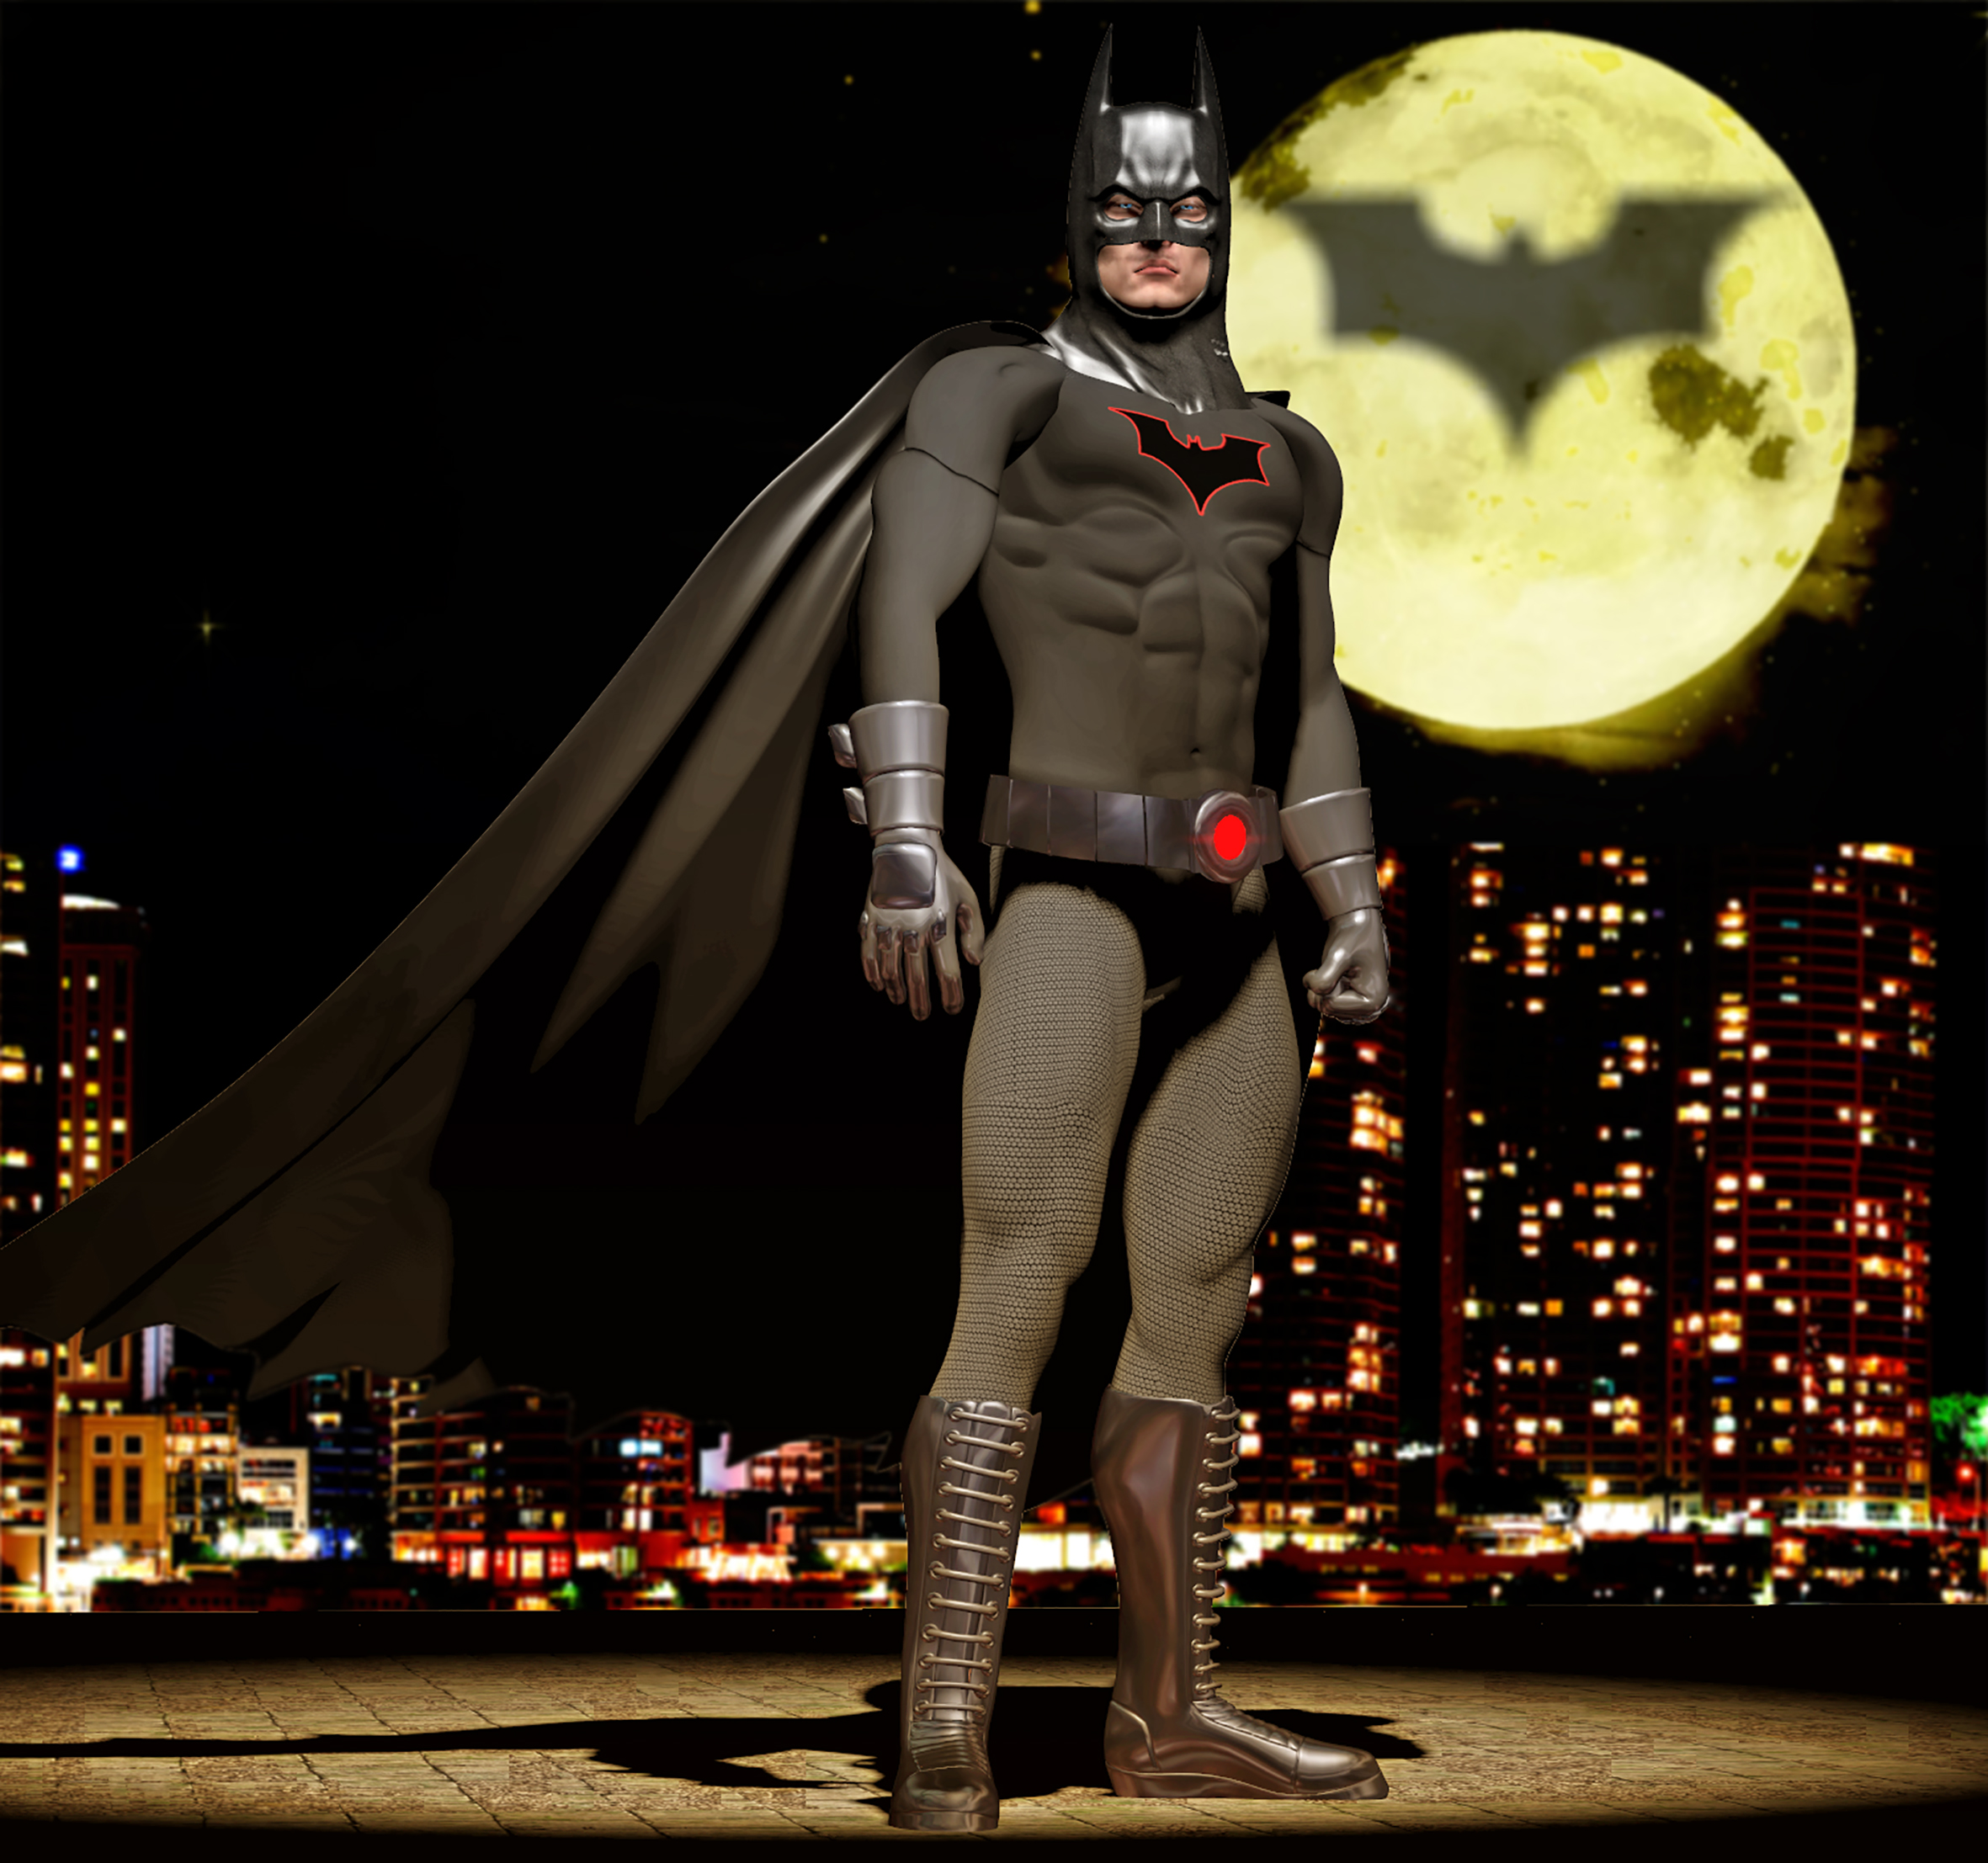 Batman second skin textures for M4